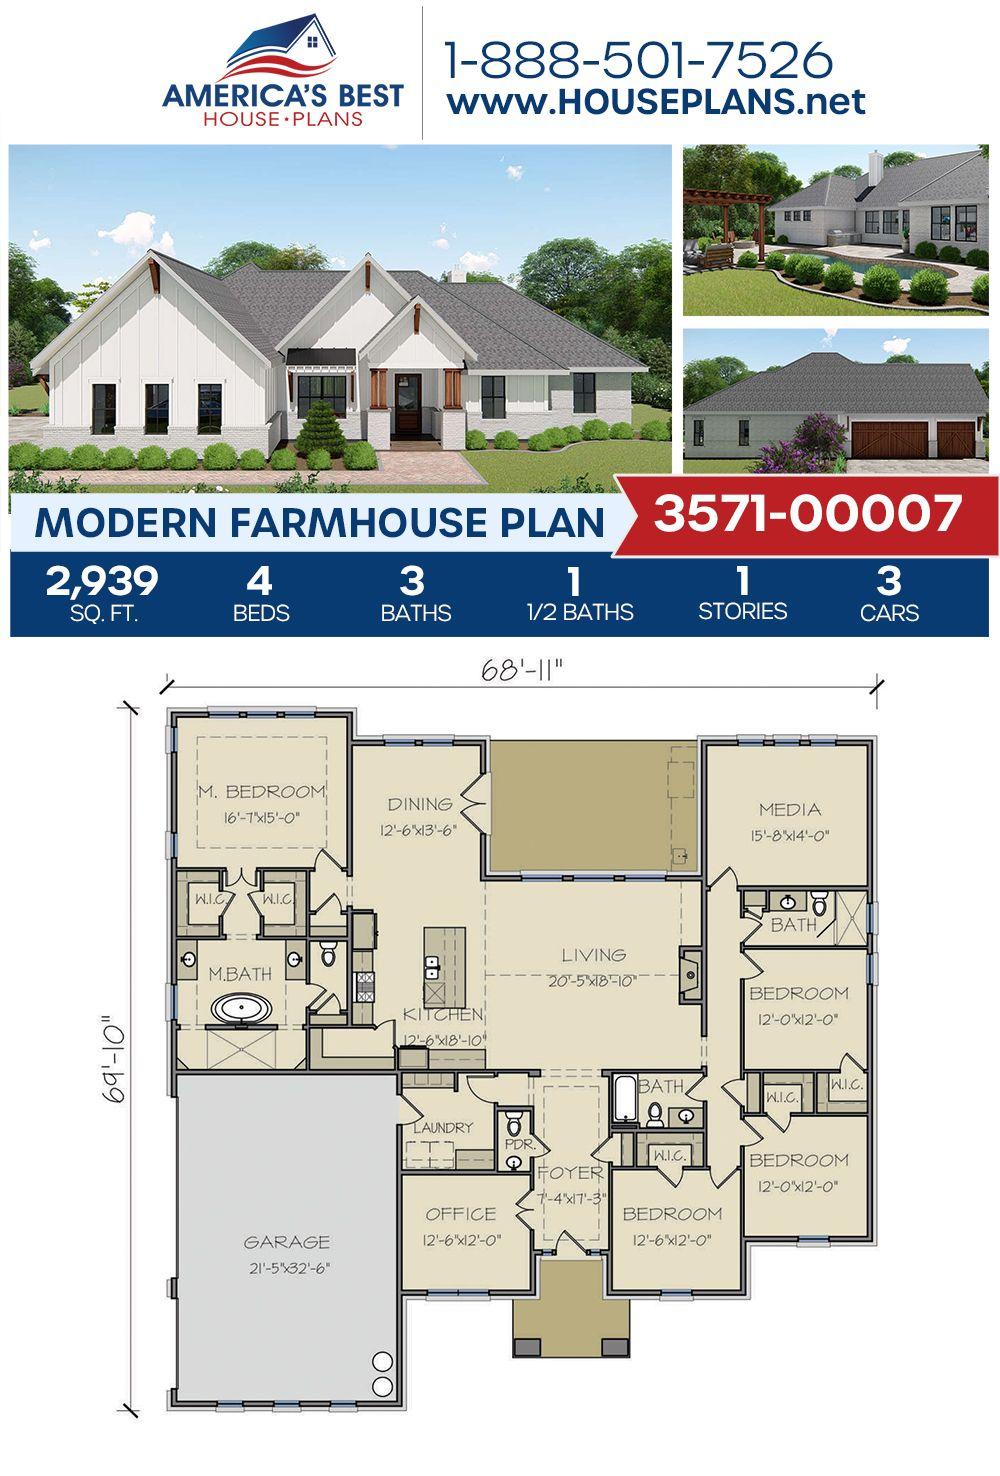 House Plan 3571 00007 Modern Farmhouse Plan 2 939 Square Feet 4 Bedrooms 3 5 Bathrooms Modern Farmhouse Plans New House Plans House Blueprints